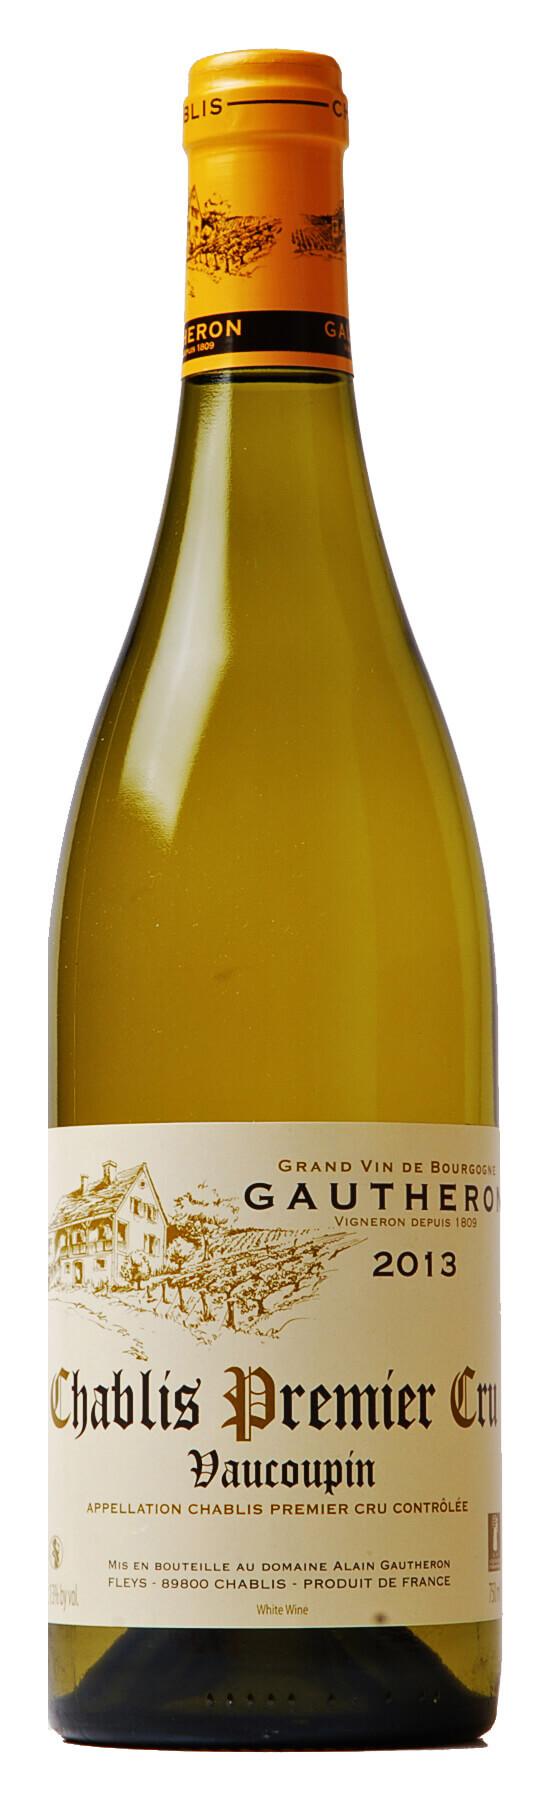 Vino bianco Chablis Premier Cru Vaucoupin